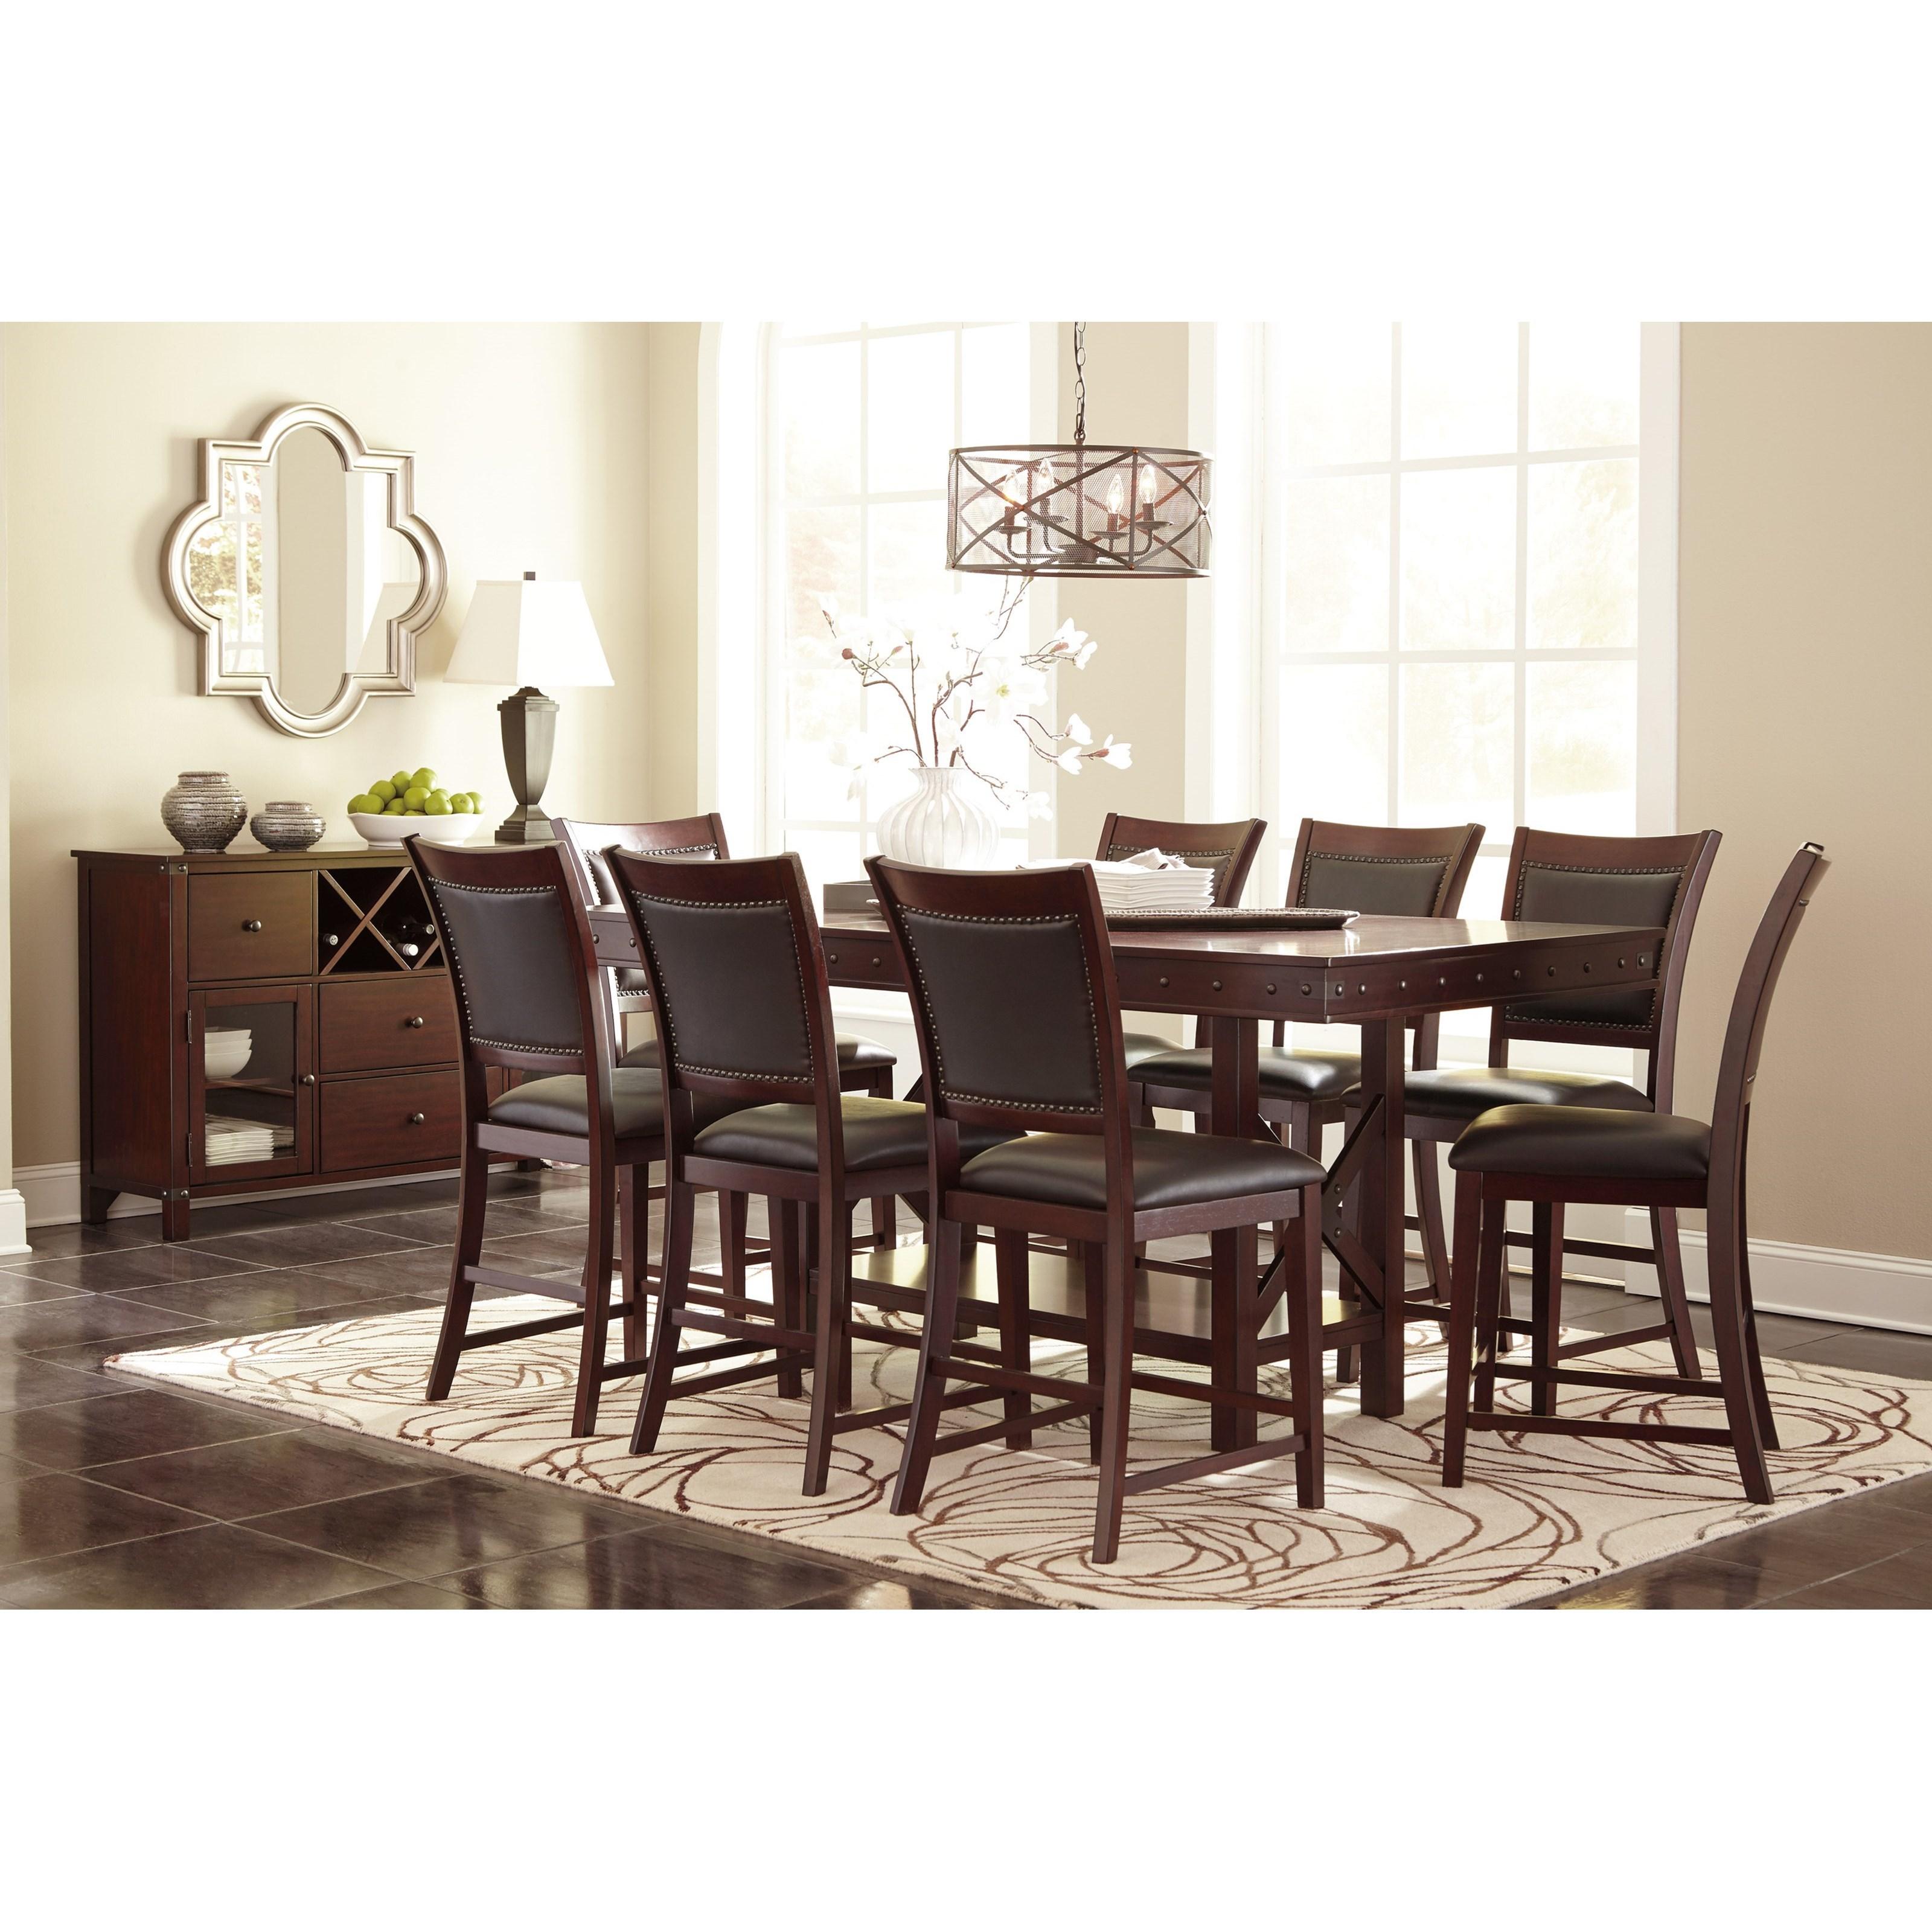 Signature design by ashley collenburg d564 124 upholstered for Furniture 124